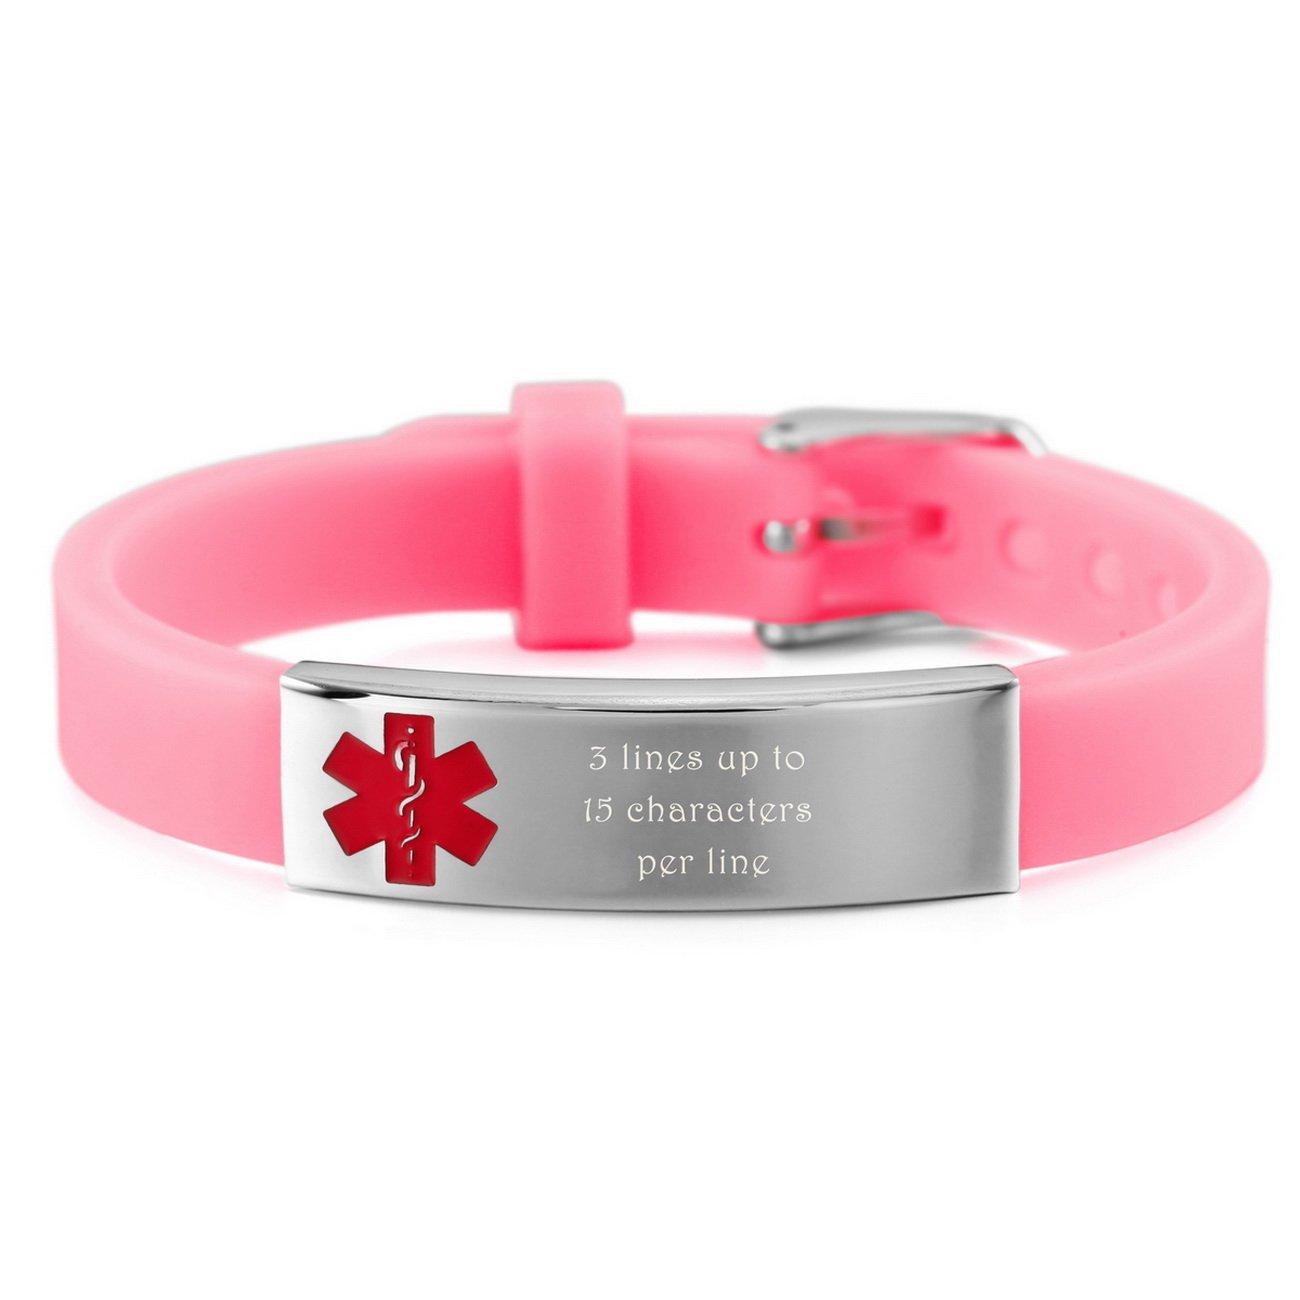 MeMeDIY Stainless Steel Rubber Bracelet Bangle Cuff Medical Alert ID Adjustable - Customized Engraving ca3020164-2